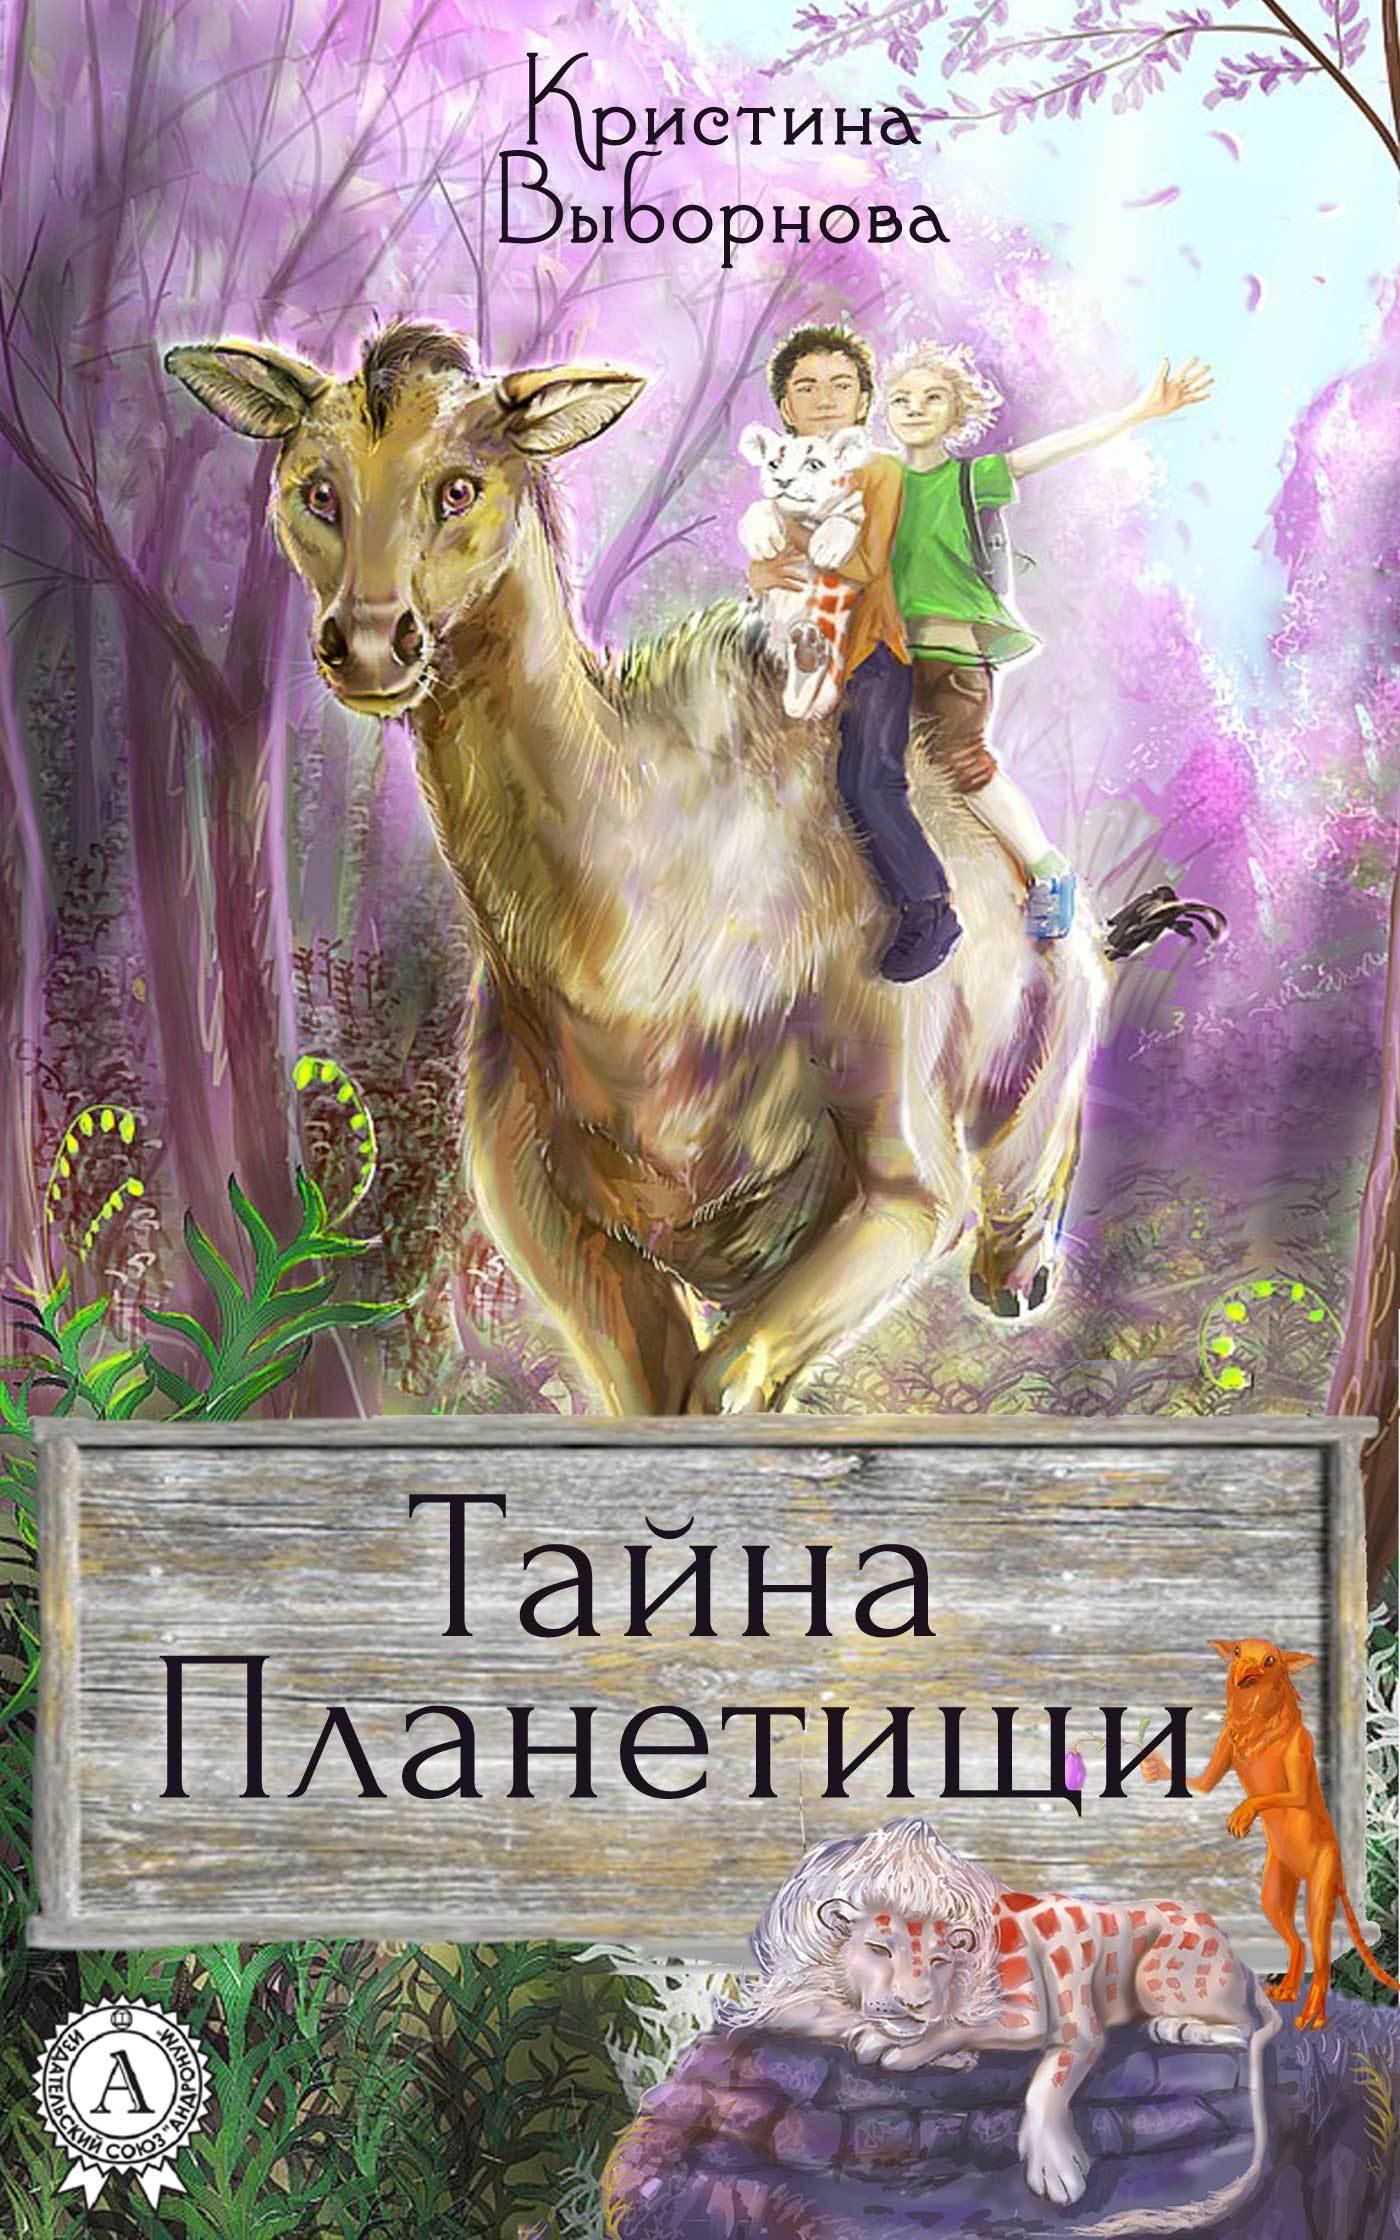 Кристина Выборнова - Тайна Планетищи